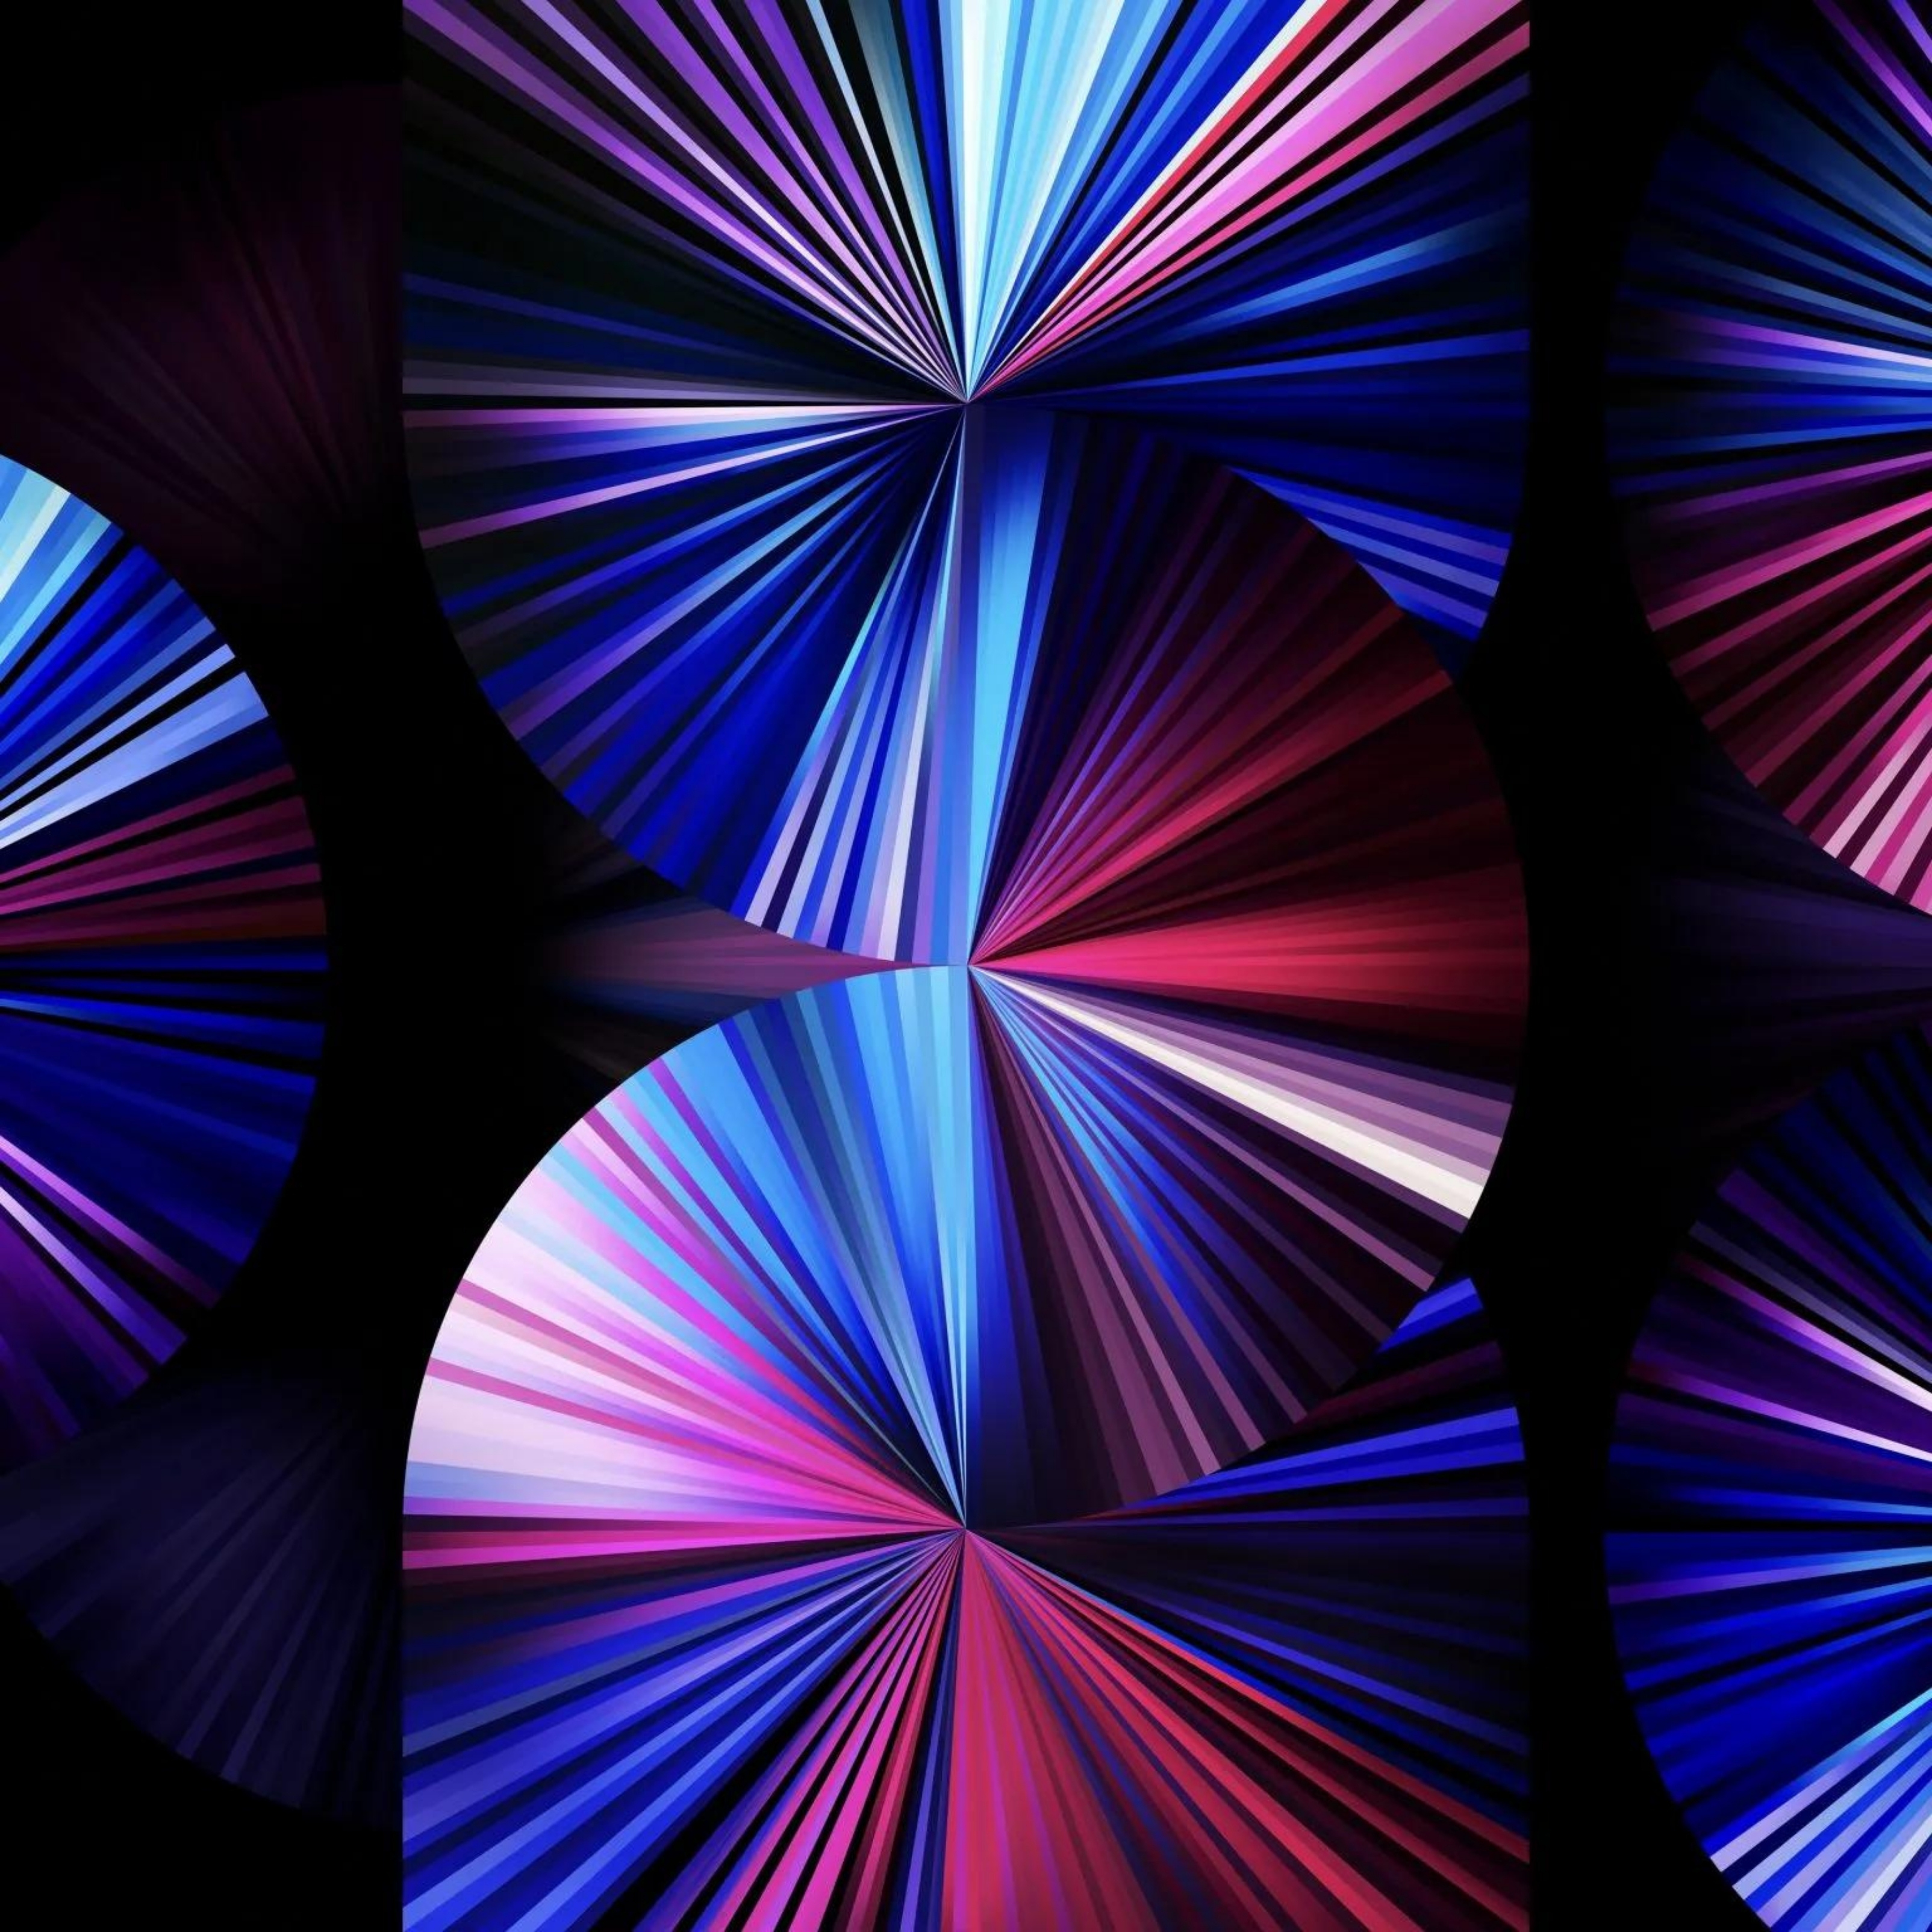 iPad Pro 2021 11 Inch Light Blue Dark Black Background iPad Wallpaper